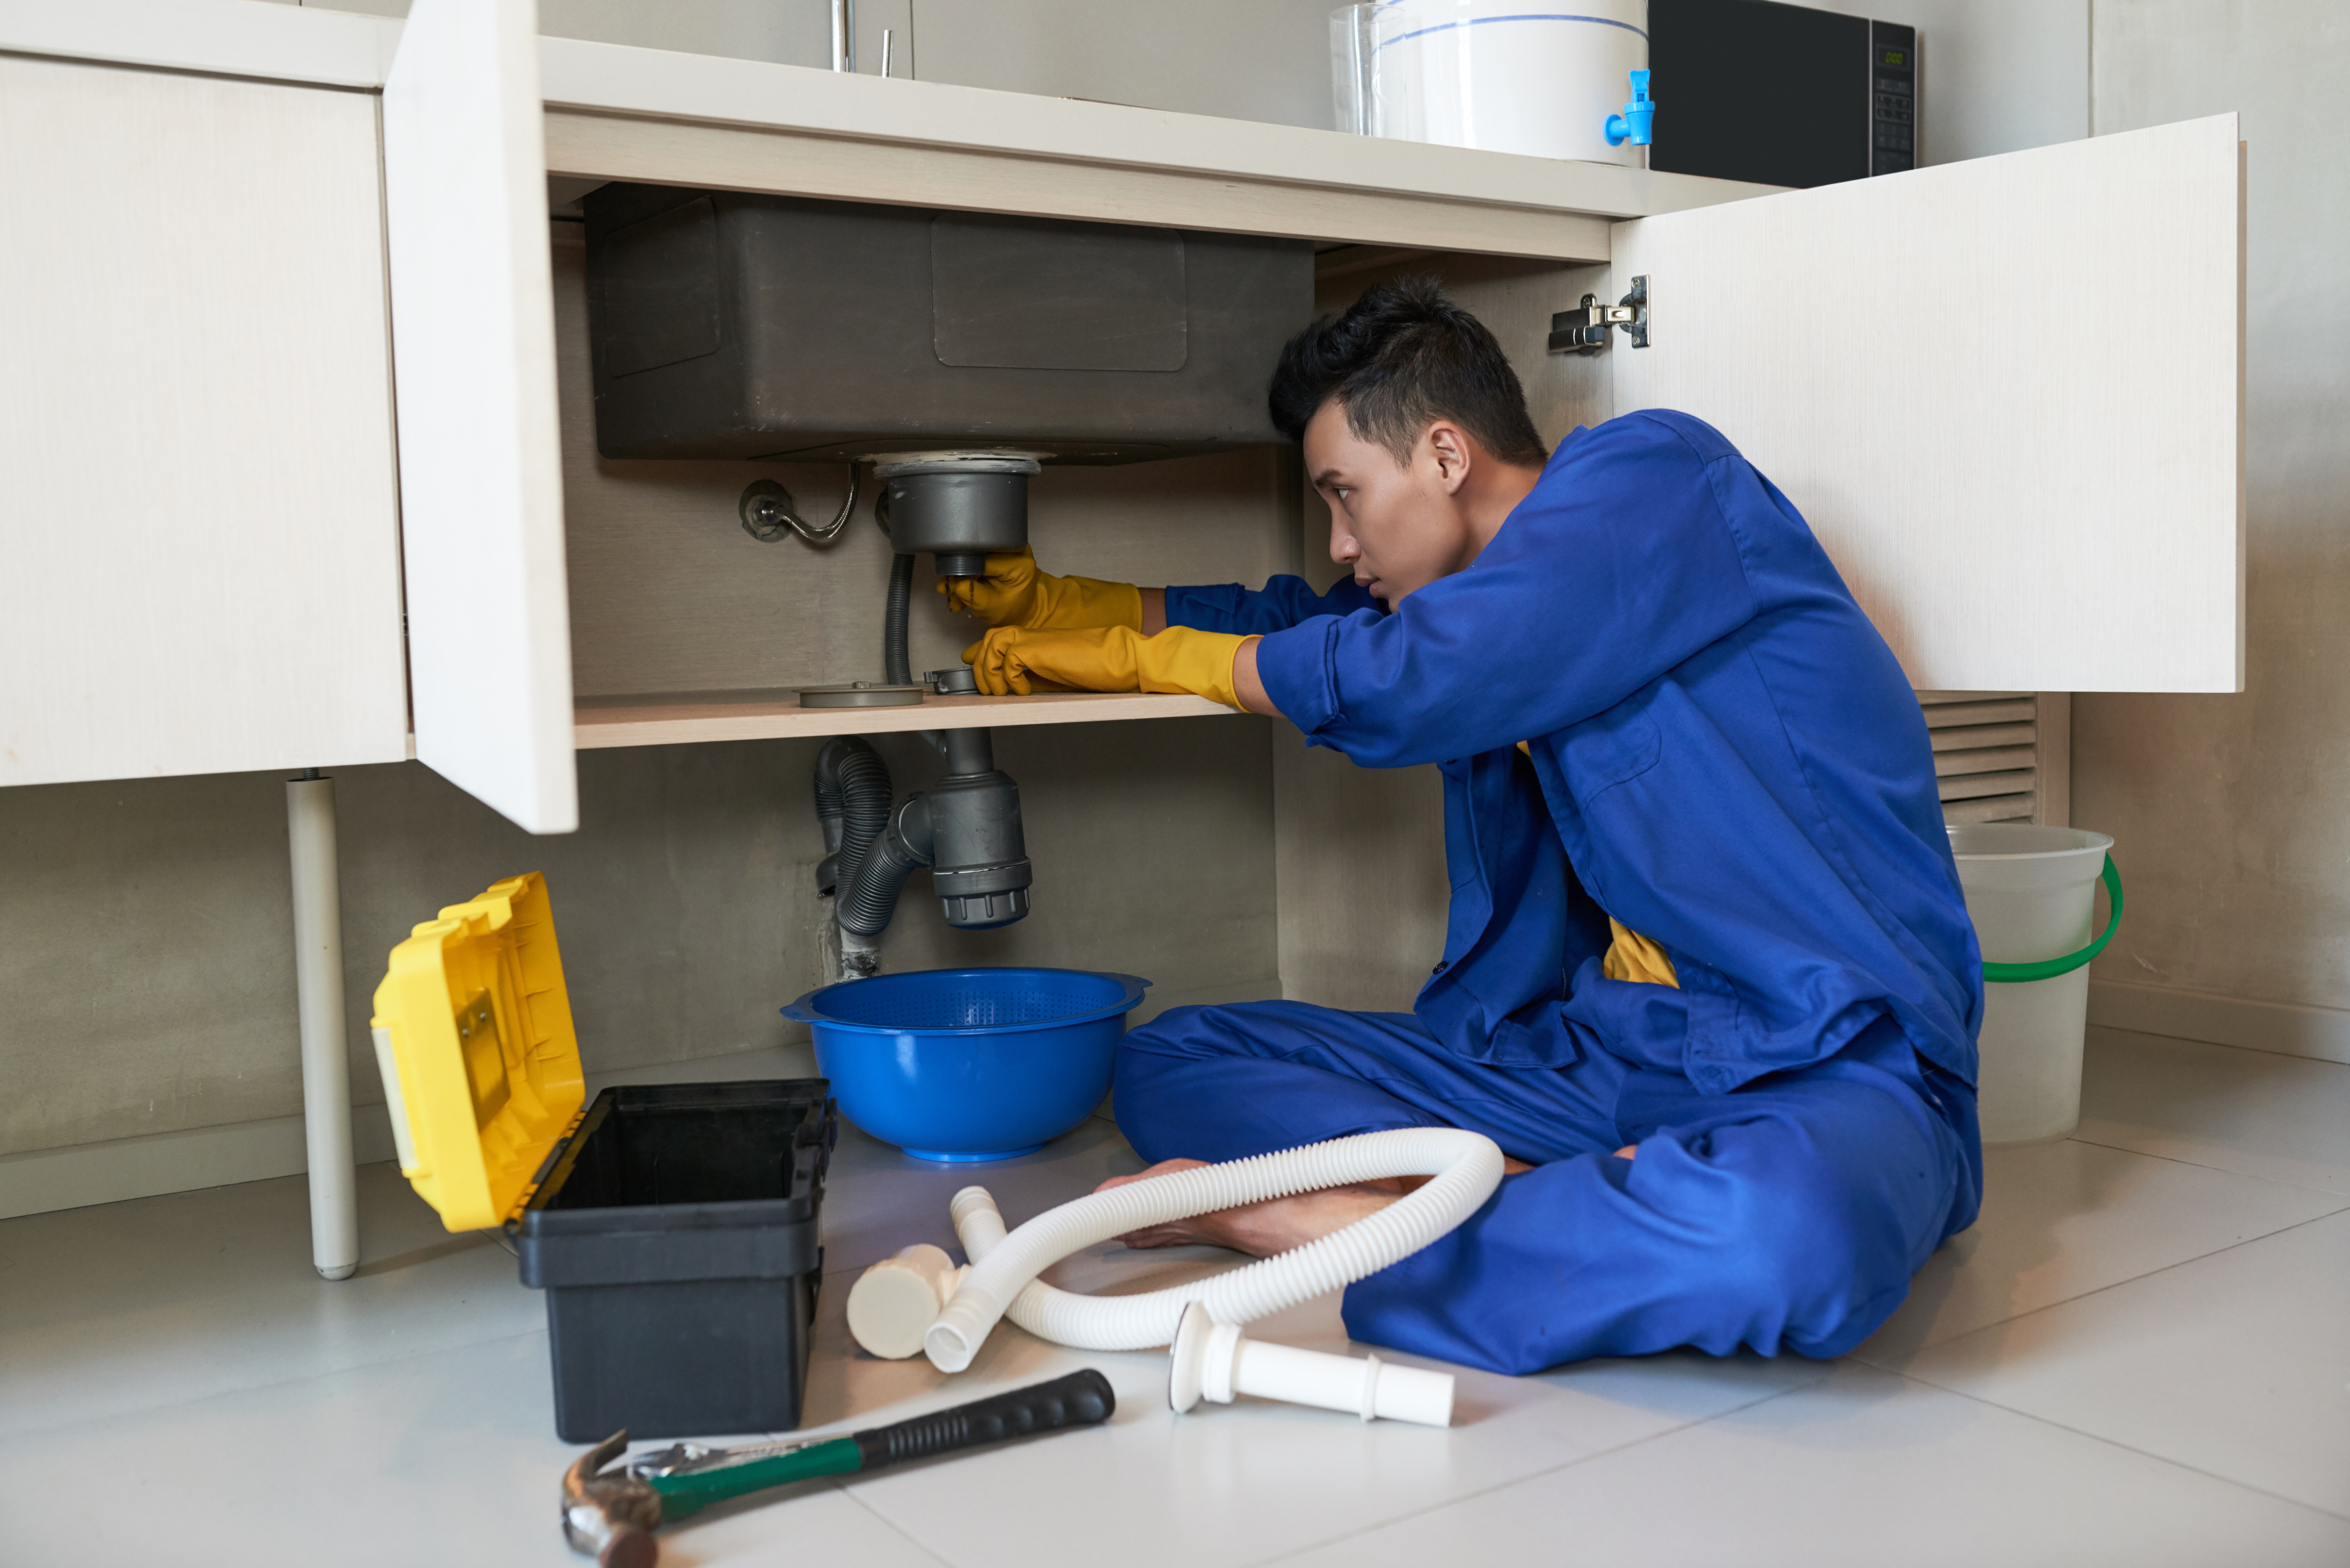 asian-plumber-blue-overalls-clearing-blockage-drain.jpg